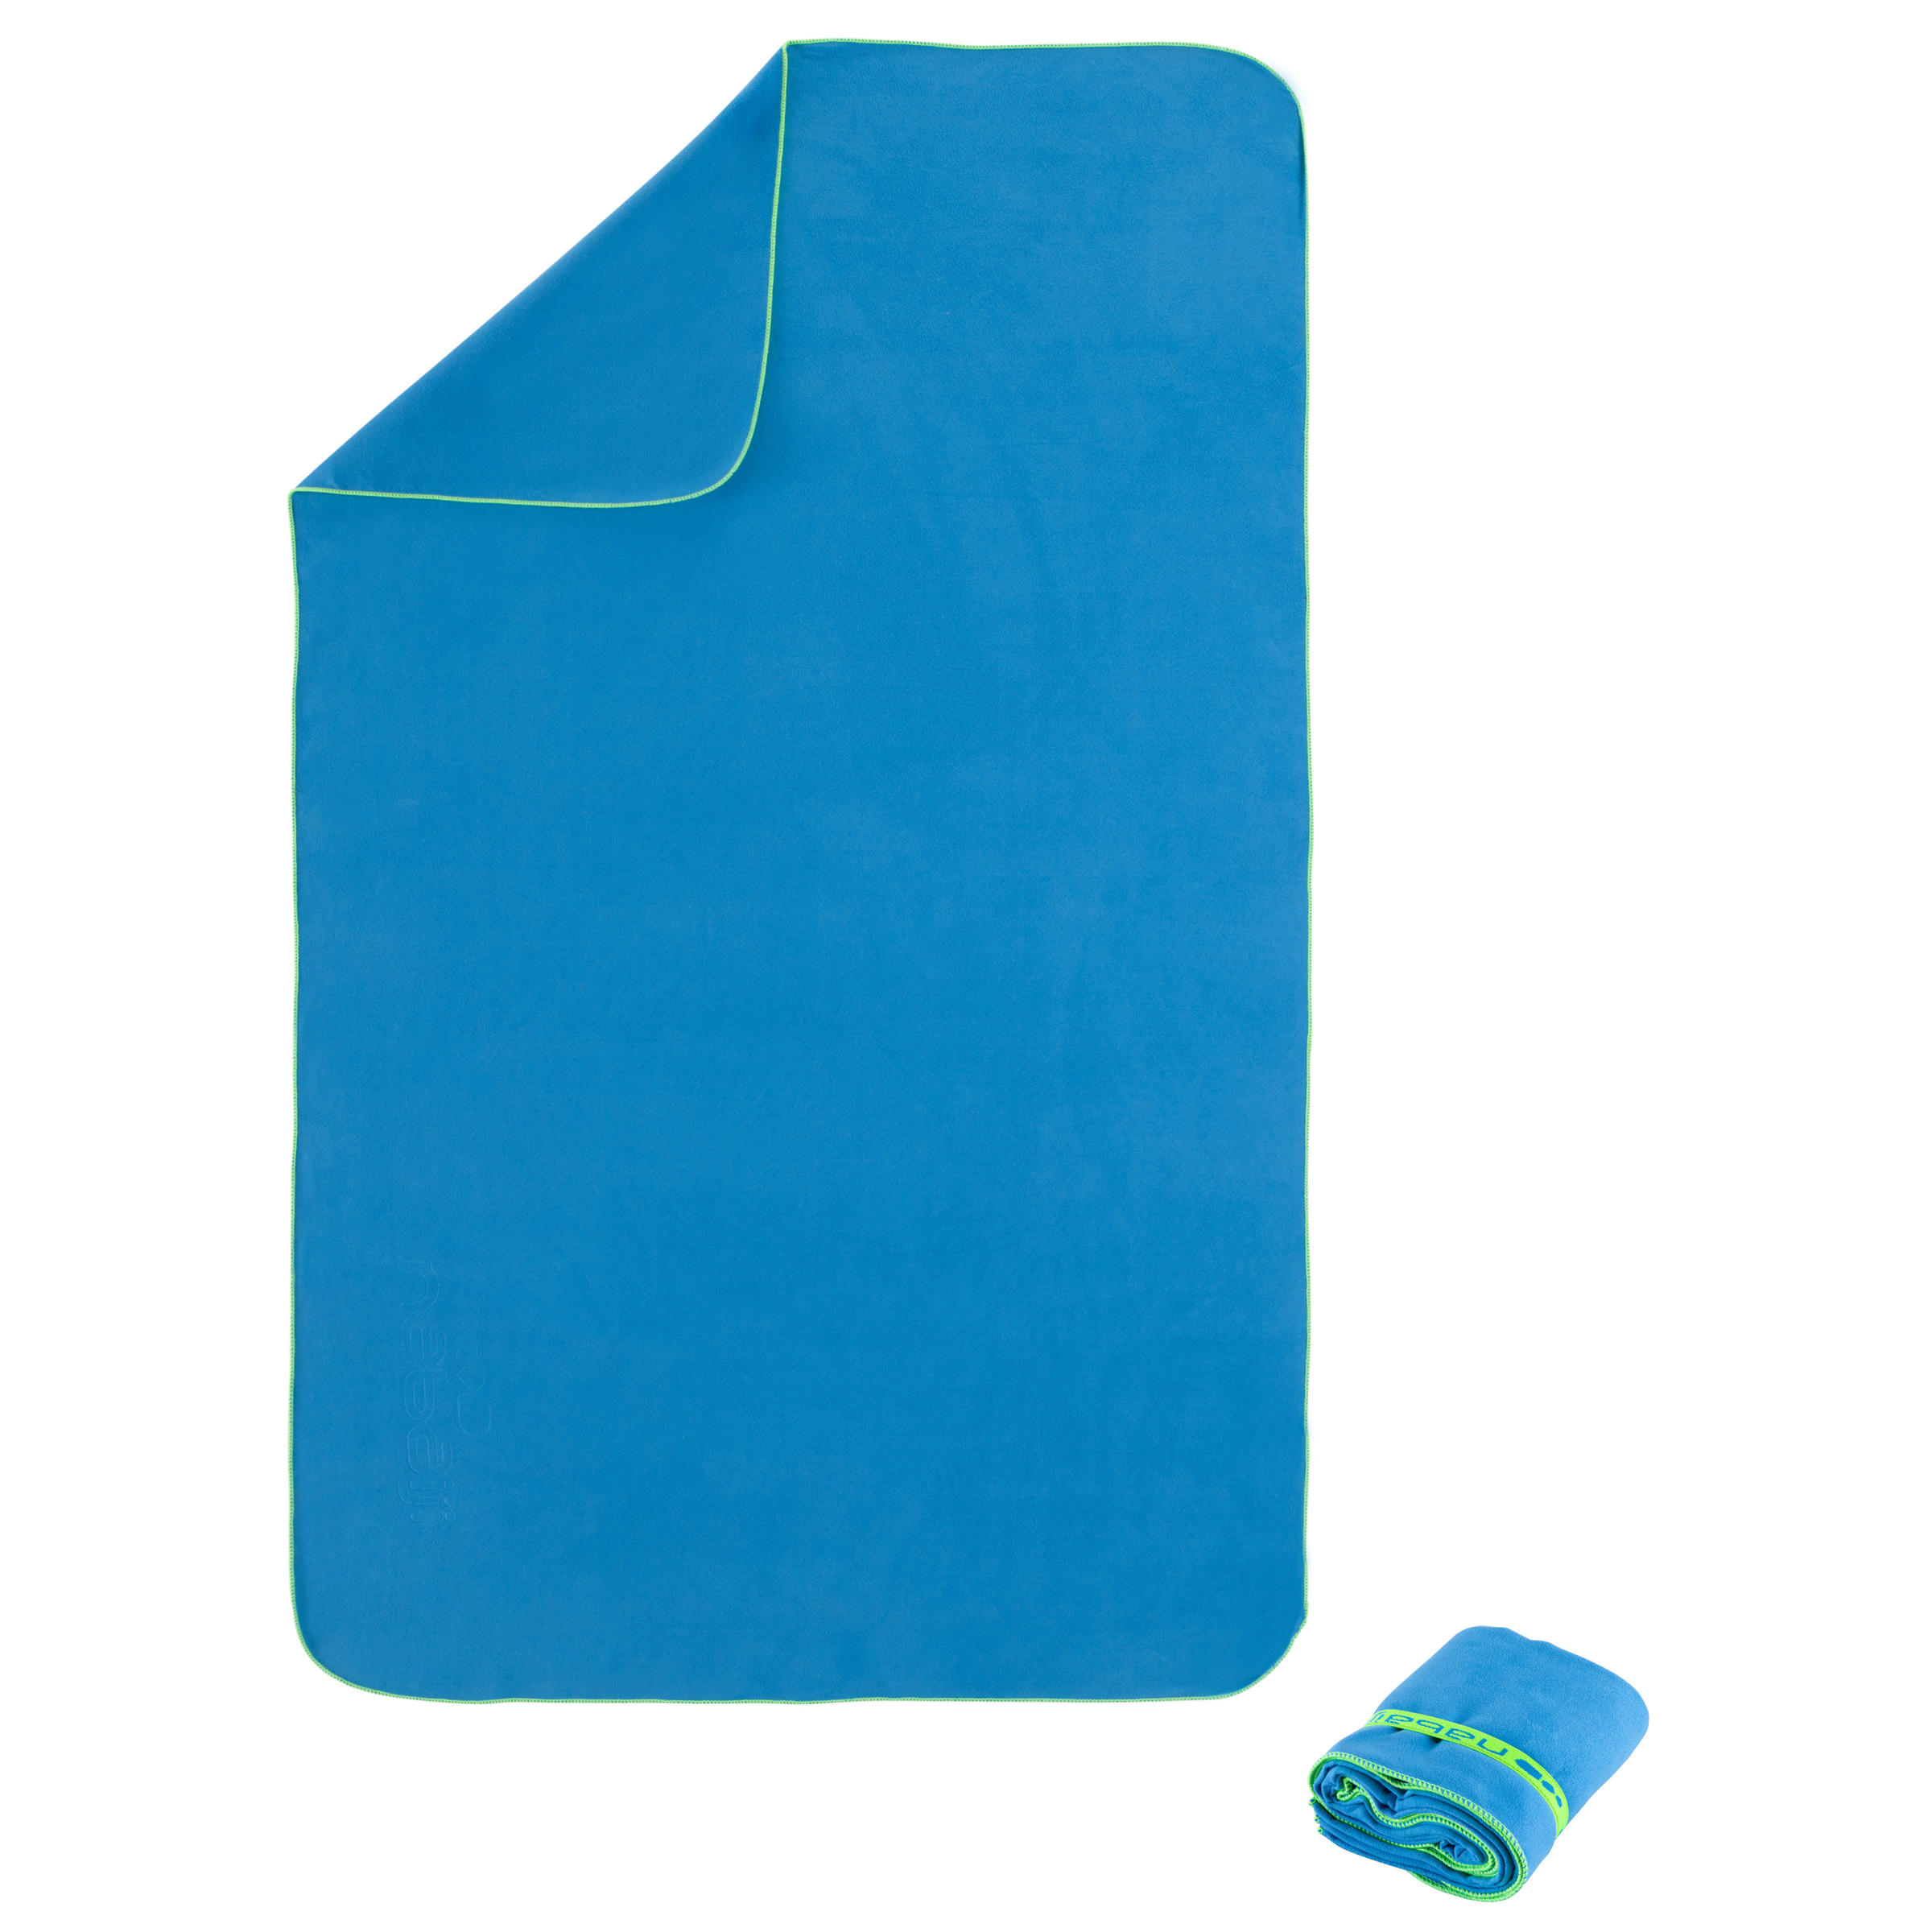 Serviette microfibre bleu cina ultra compacte taille G 80 x 130 cm